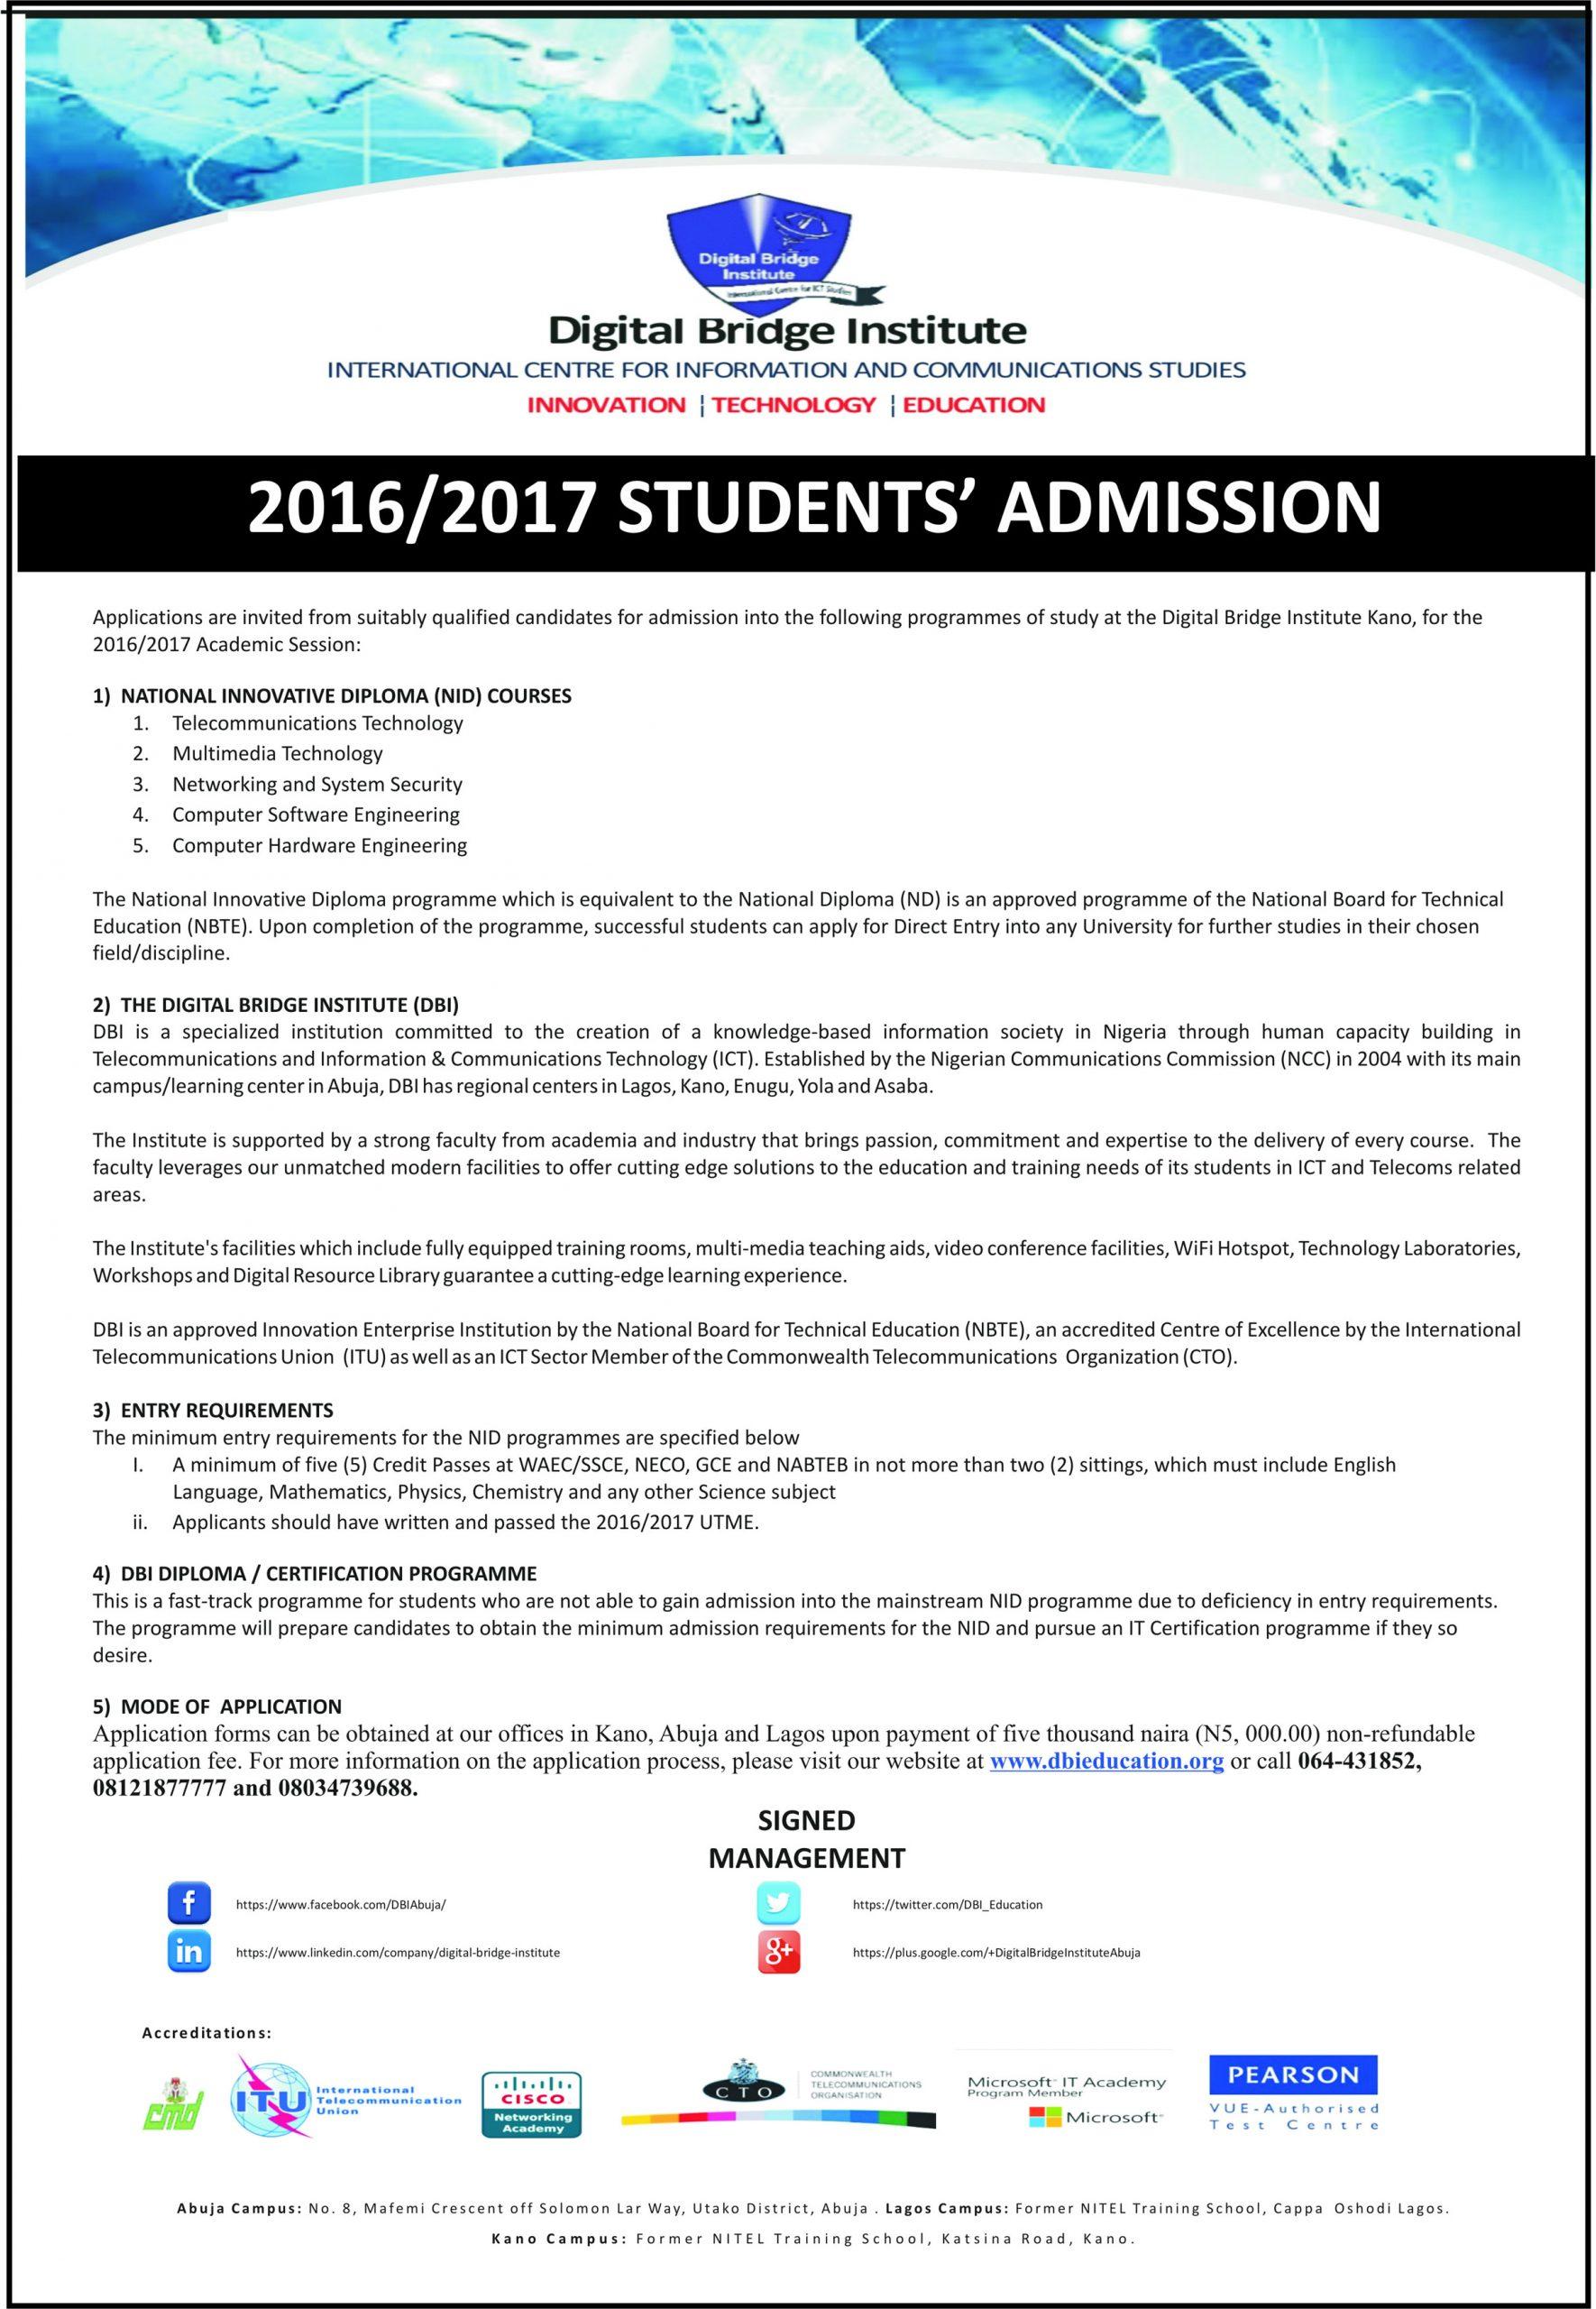 2016/2017 Students' Admission